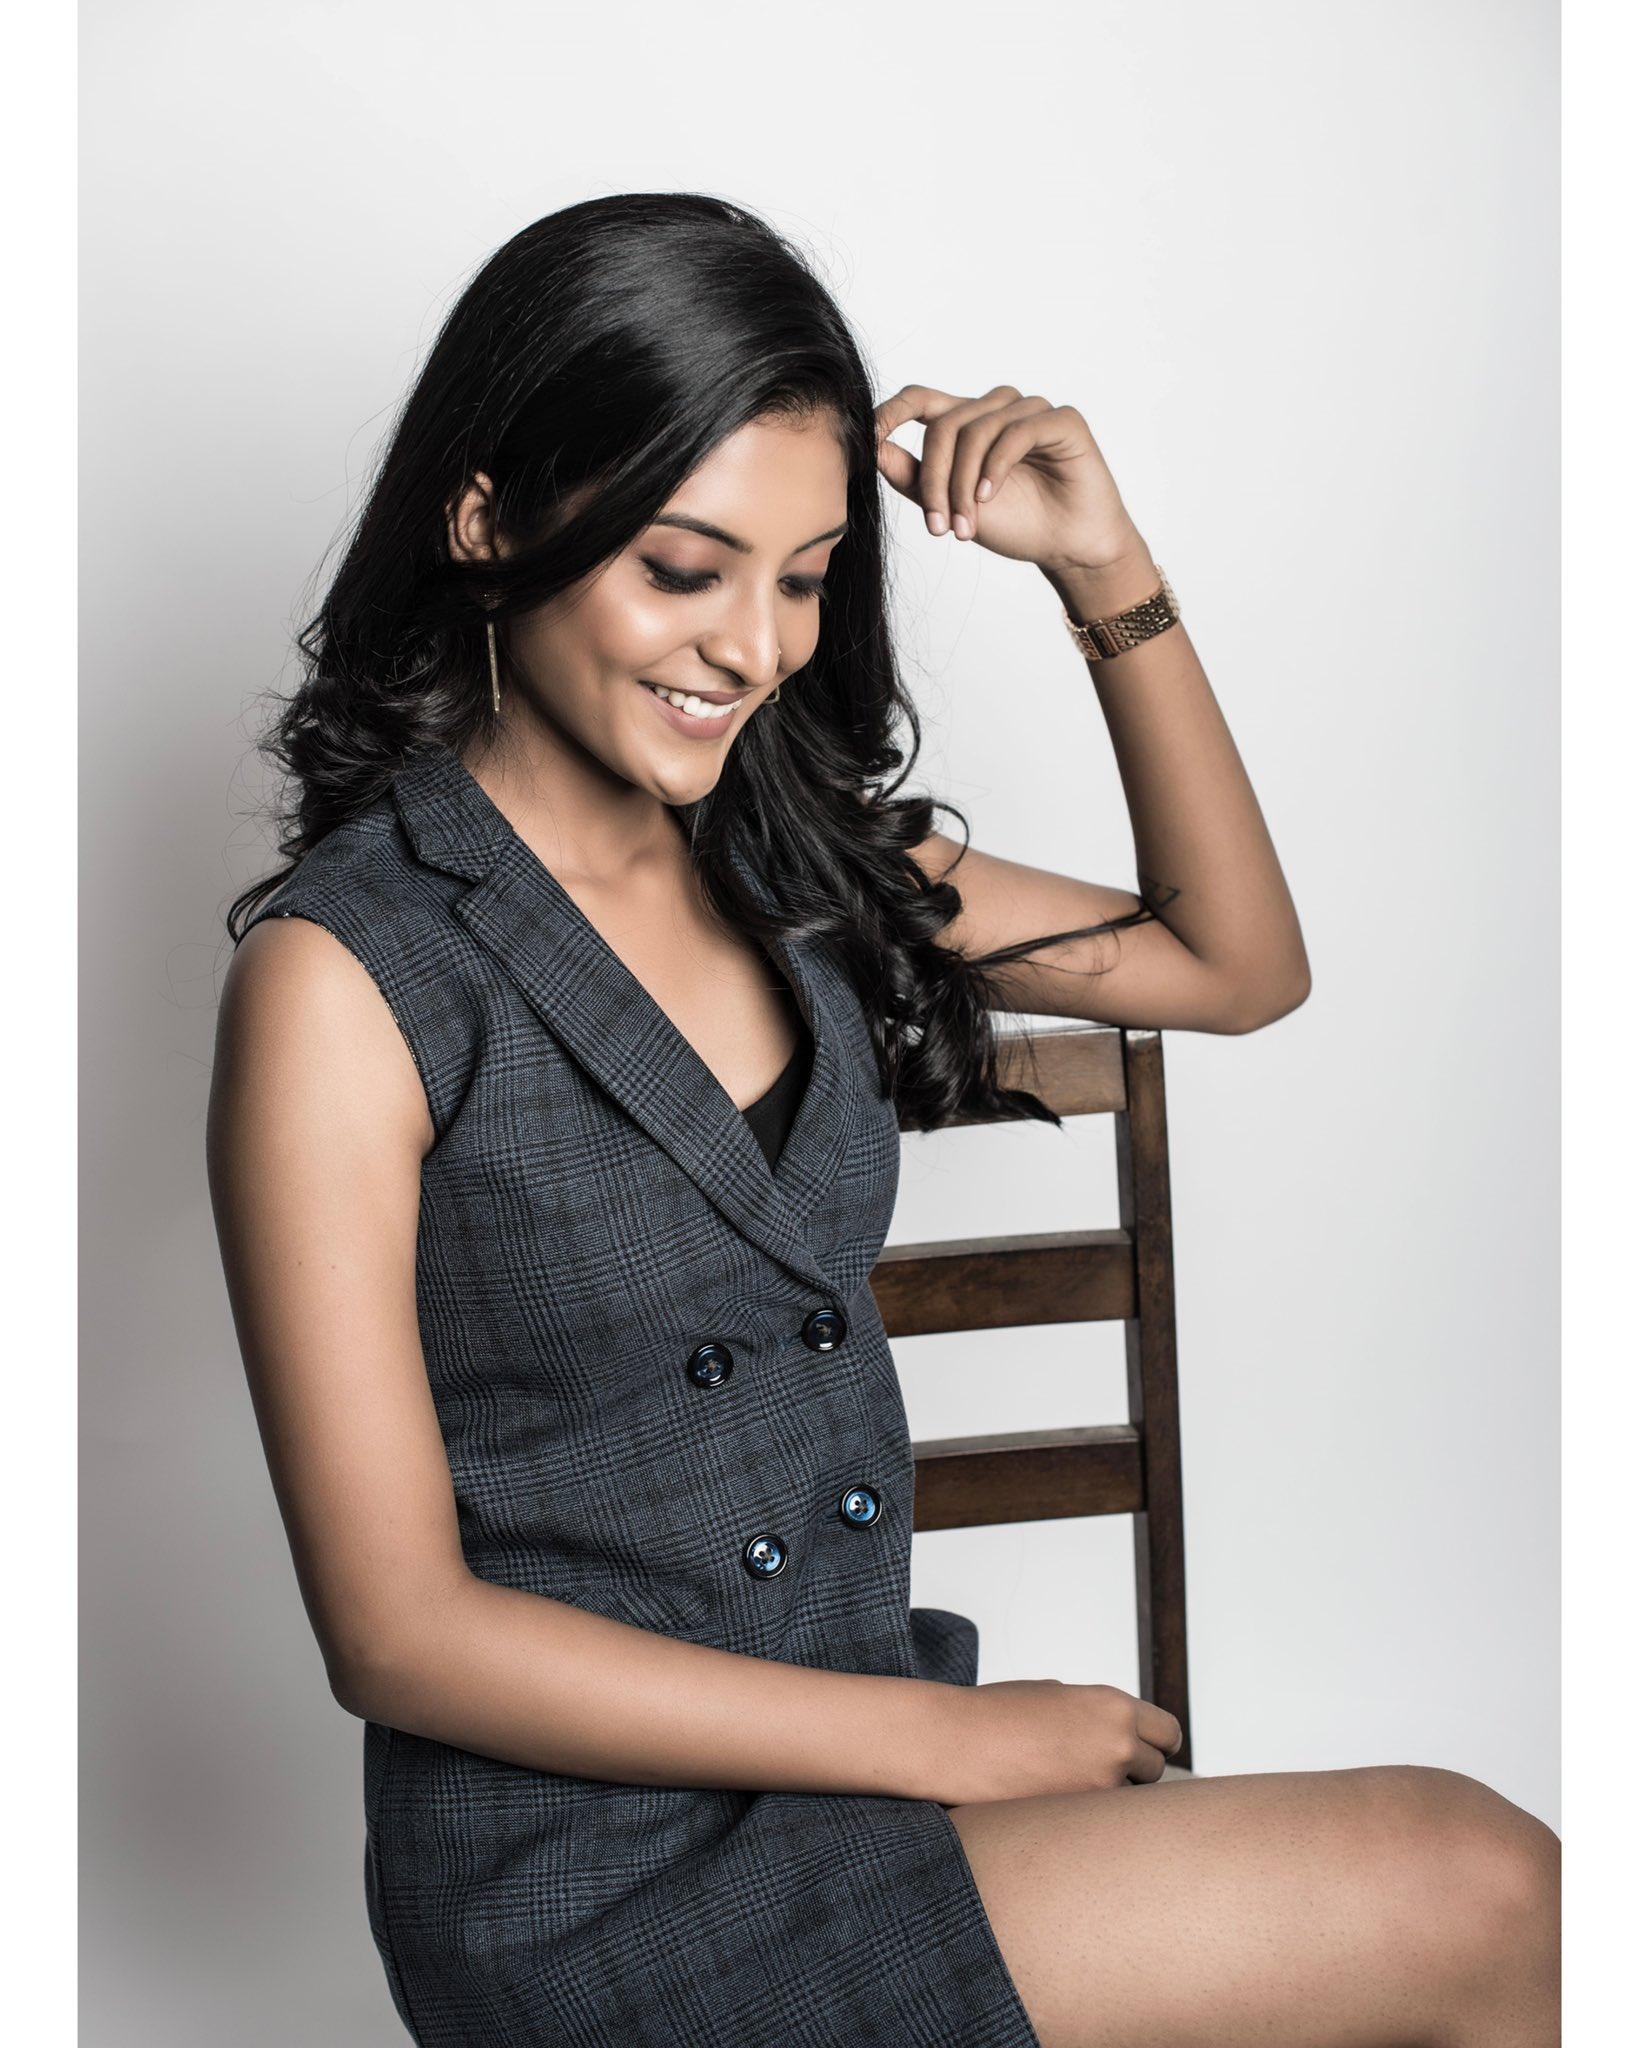 Tamil Actress Nivedhithaa Sathish New Photos (15)